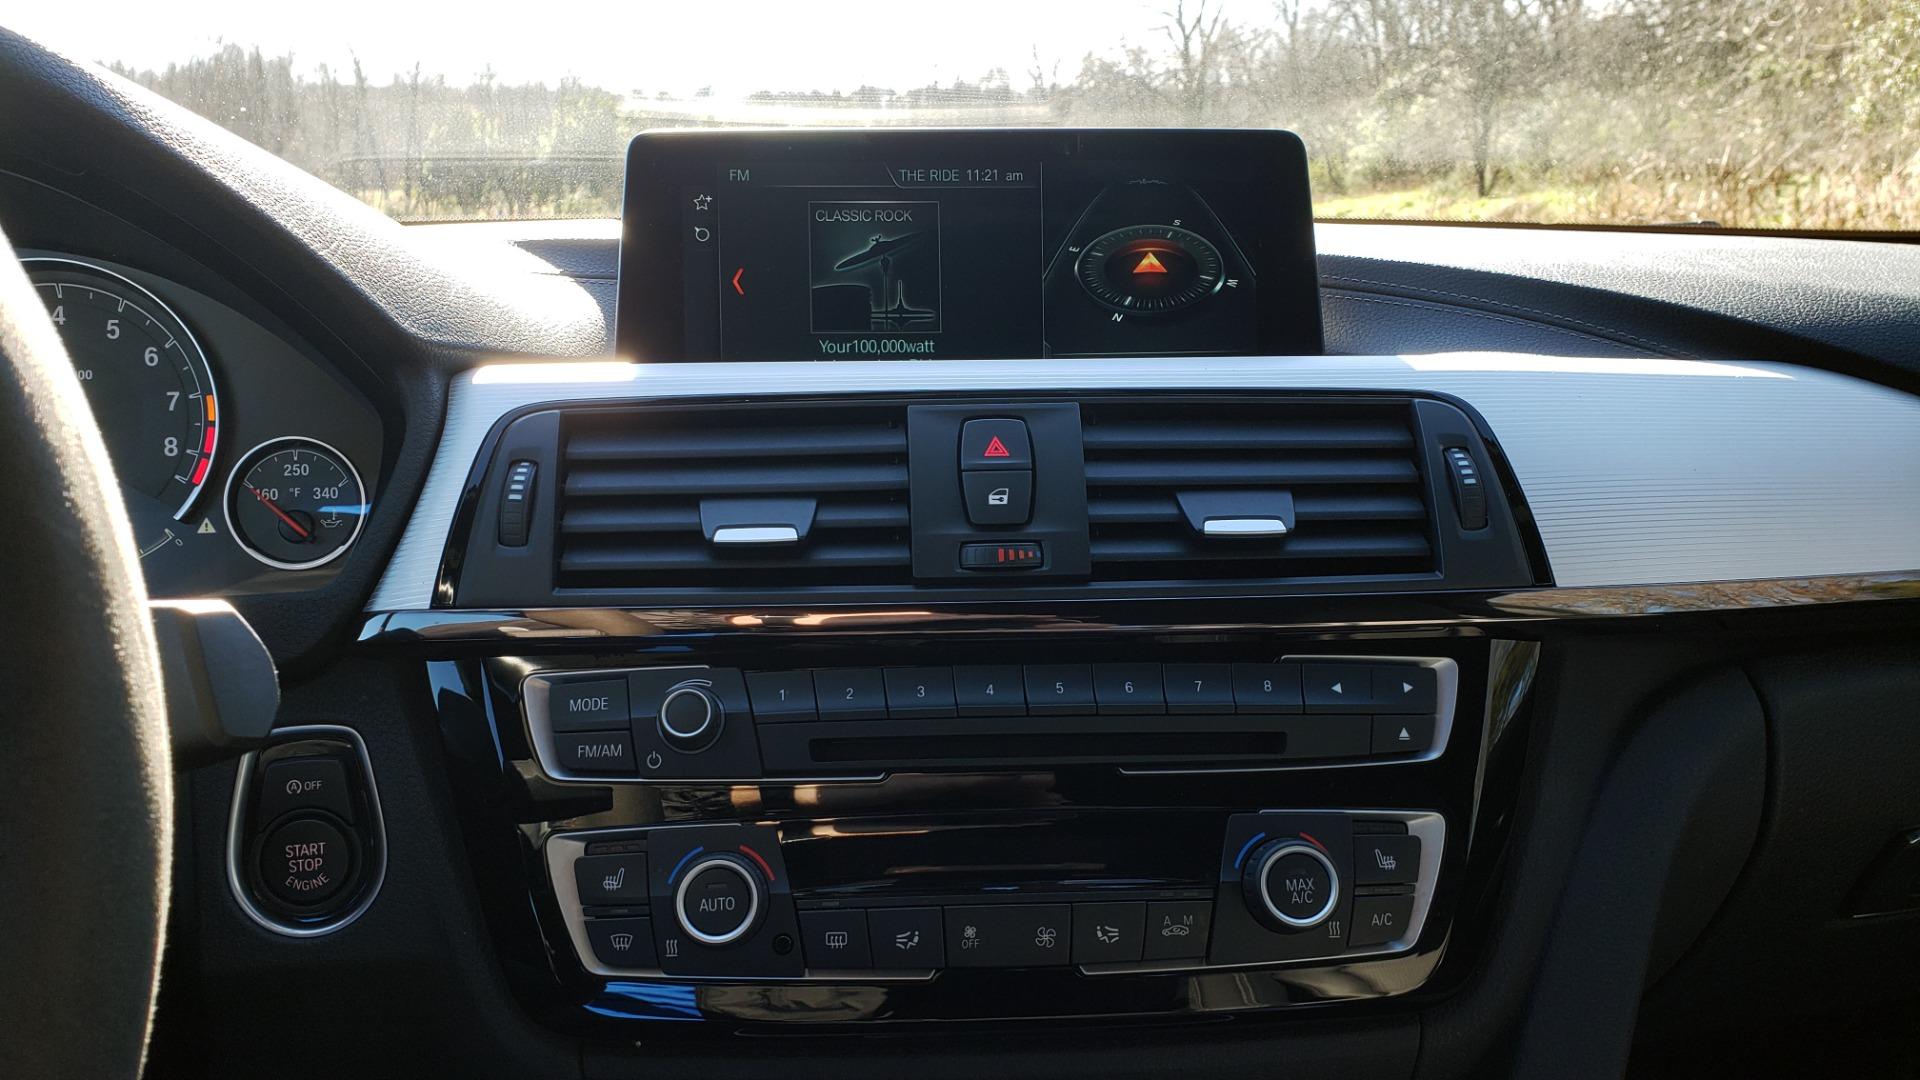 Used 2018 BMW M4 COMP PKG / EXEC / M-DRIVER / PARK CNTRL / ACTIVE BLIND SPOT for sale Sold at Formula Imports in Charlotte NC 28227 45